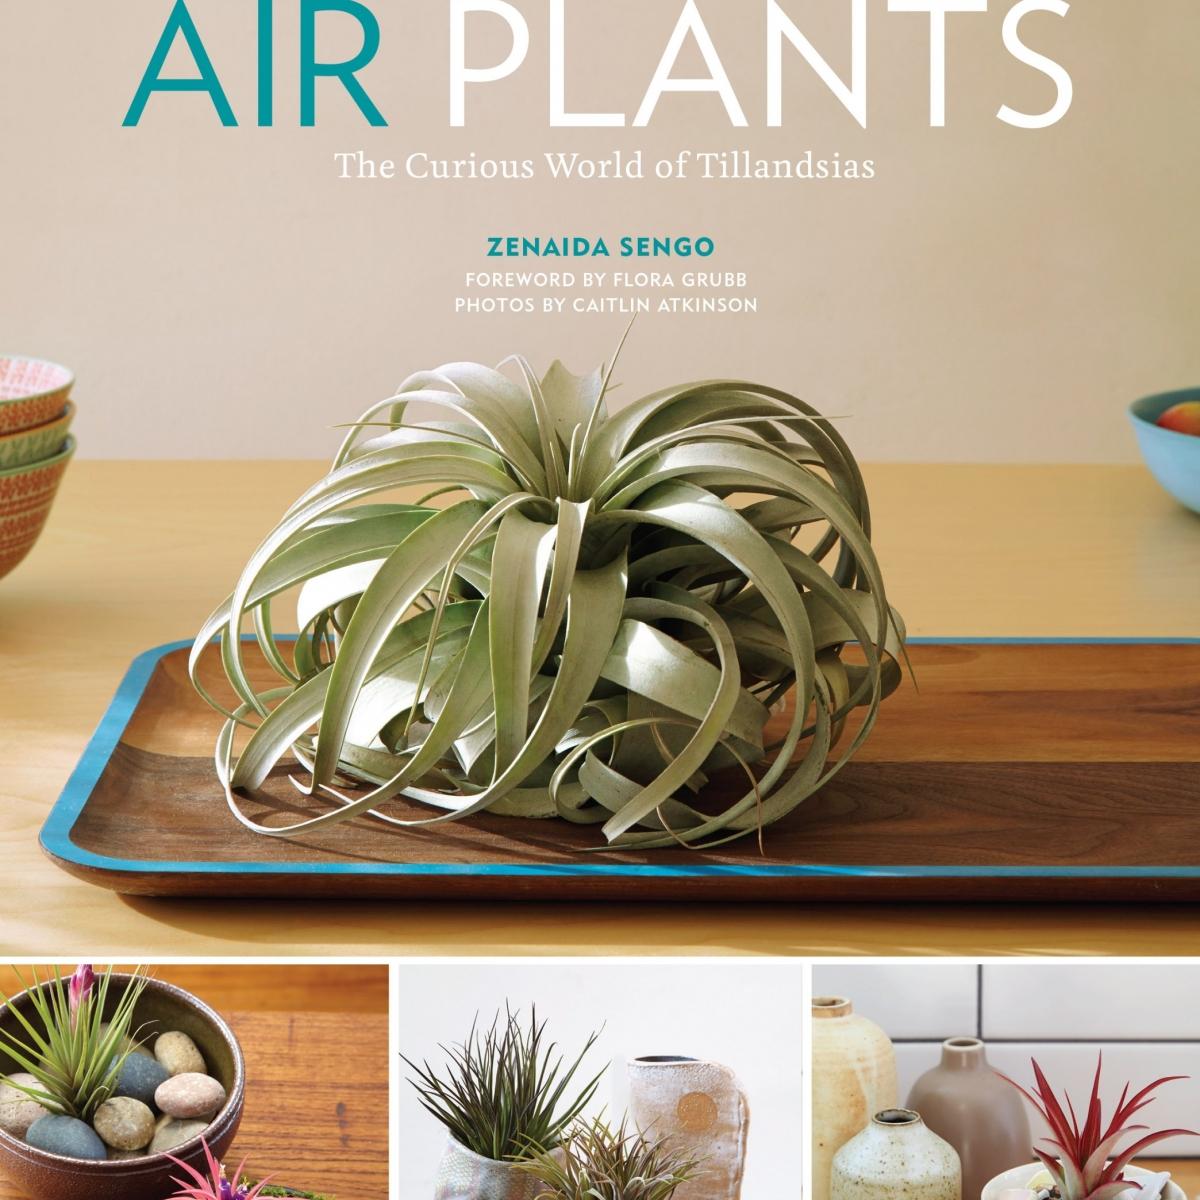 Air Plants Book by Zenaida Sengo